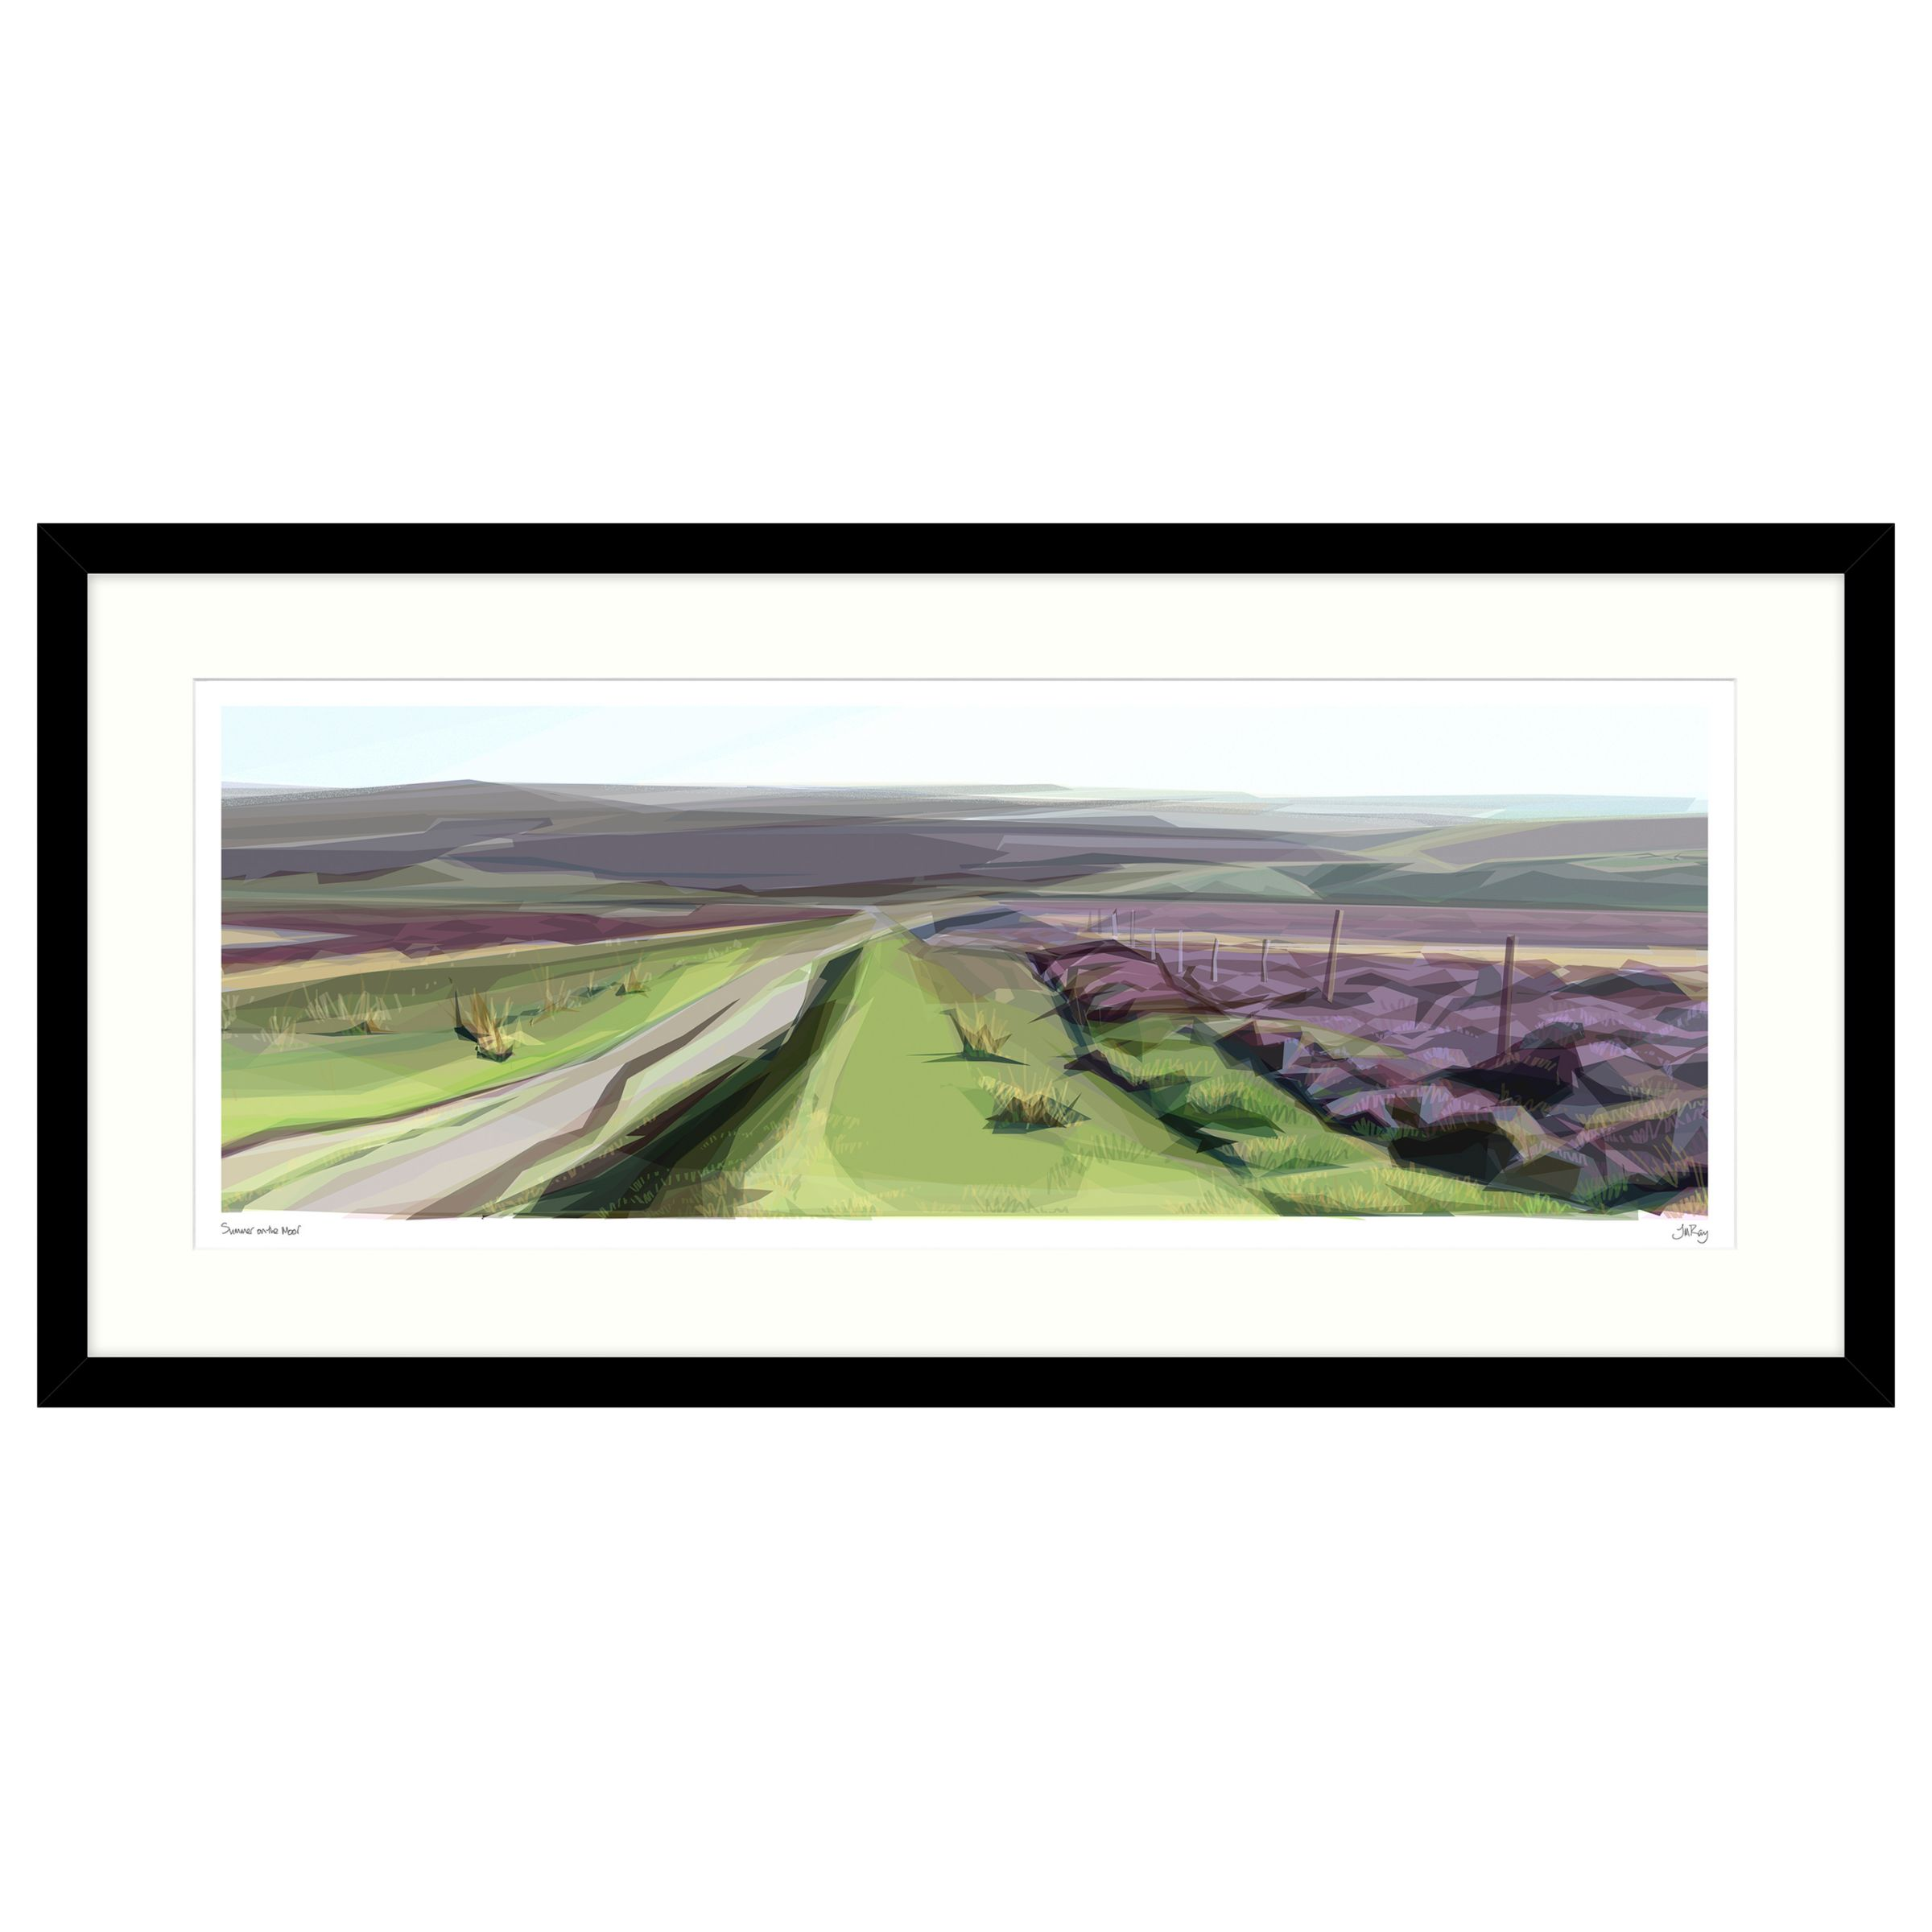 John Lewis Jill Ray - Summer On The Moor Framed Print, 104 x 49cm